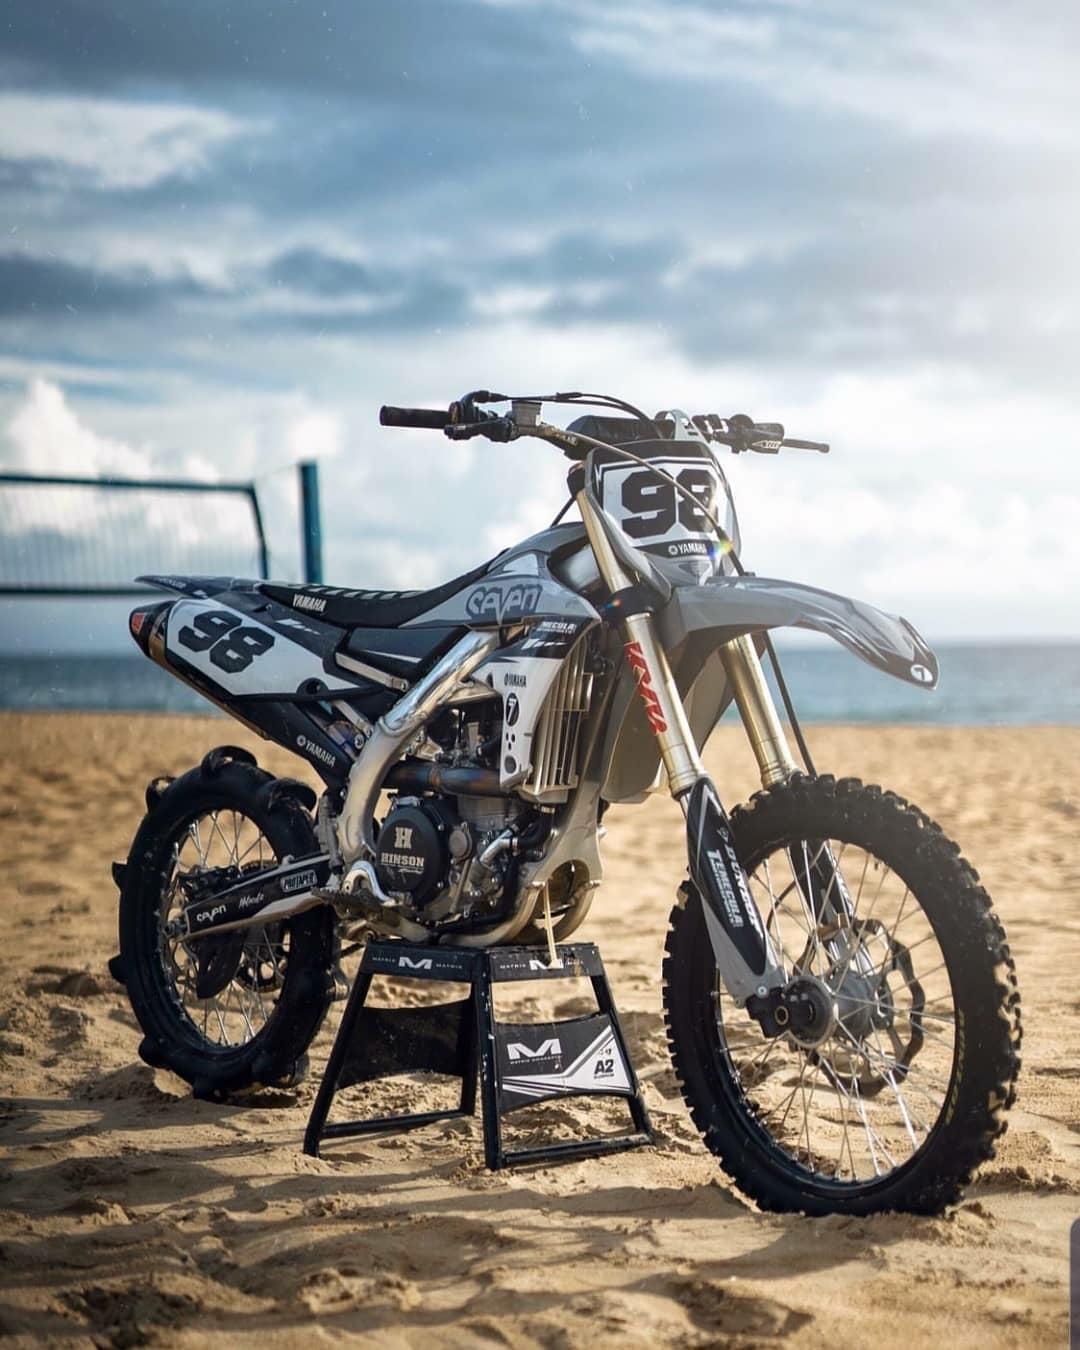 Yamaha dirt bike on beach